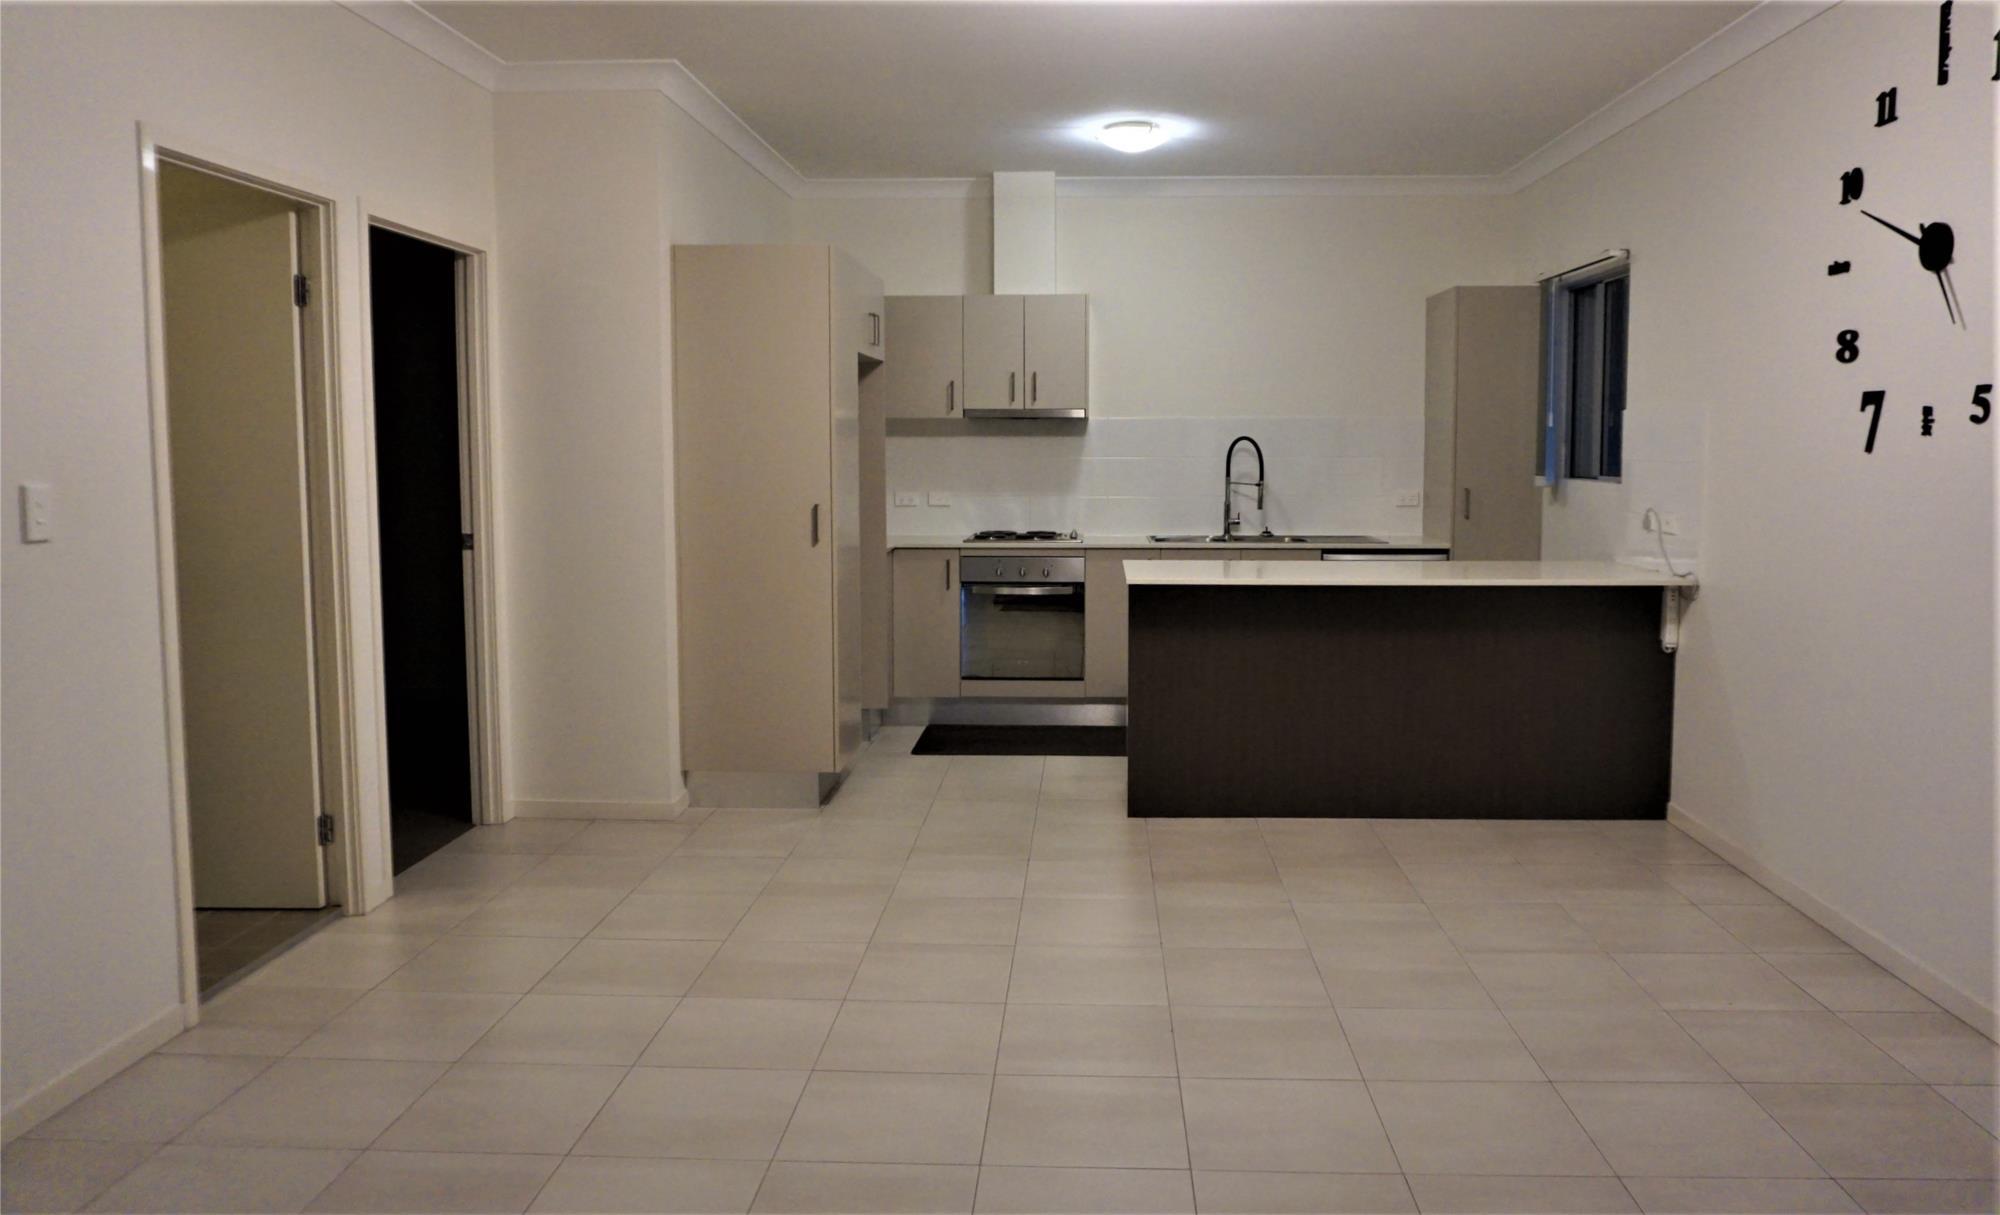 property-image-0